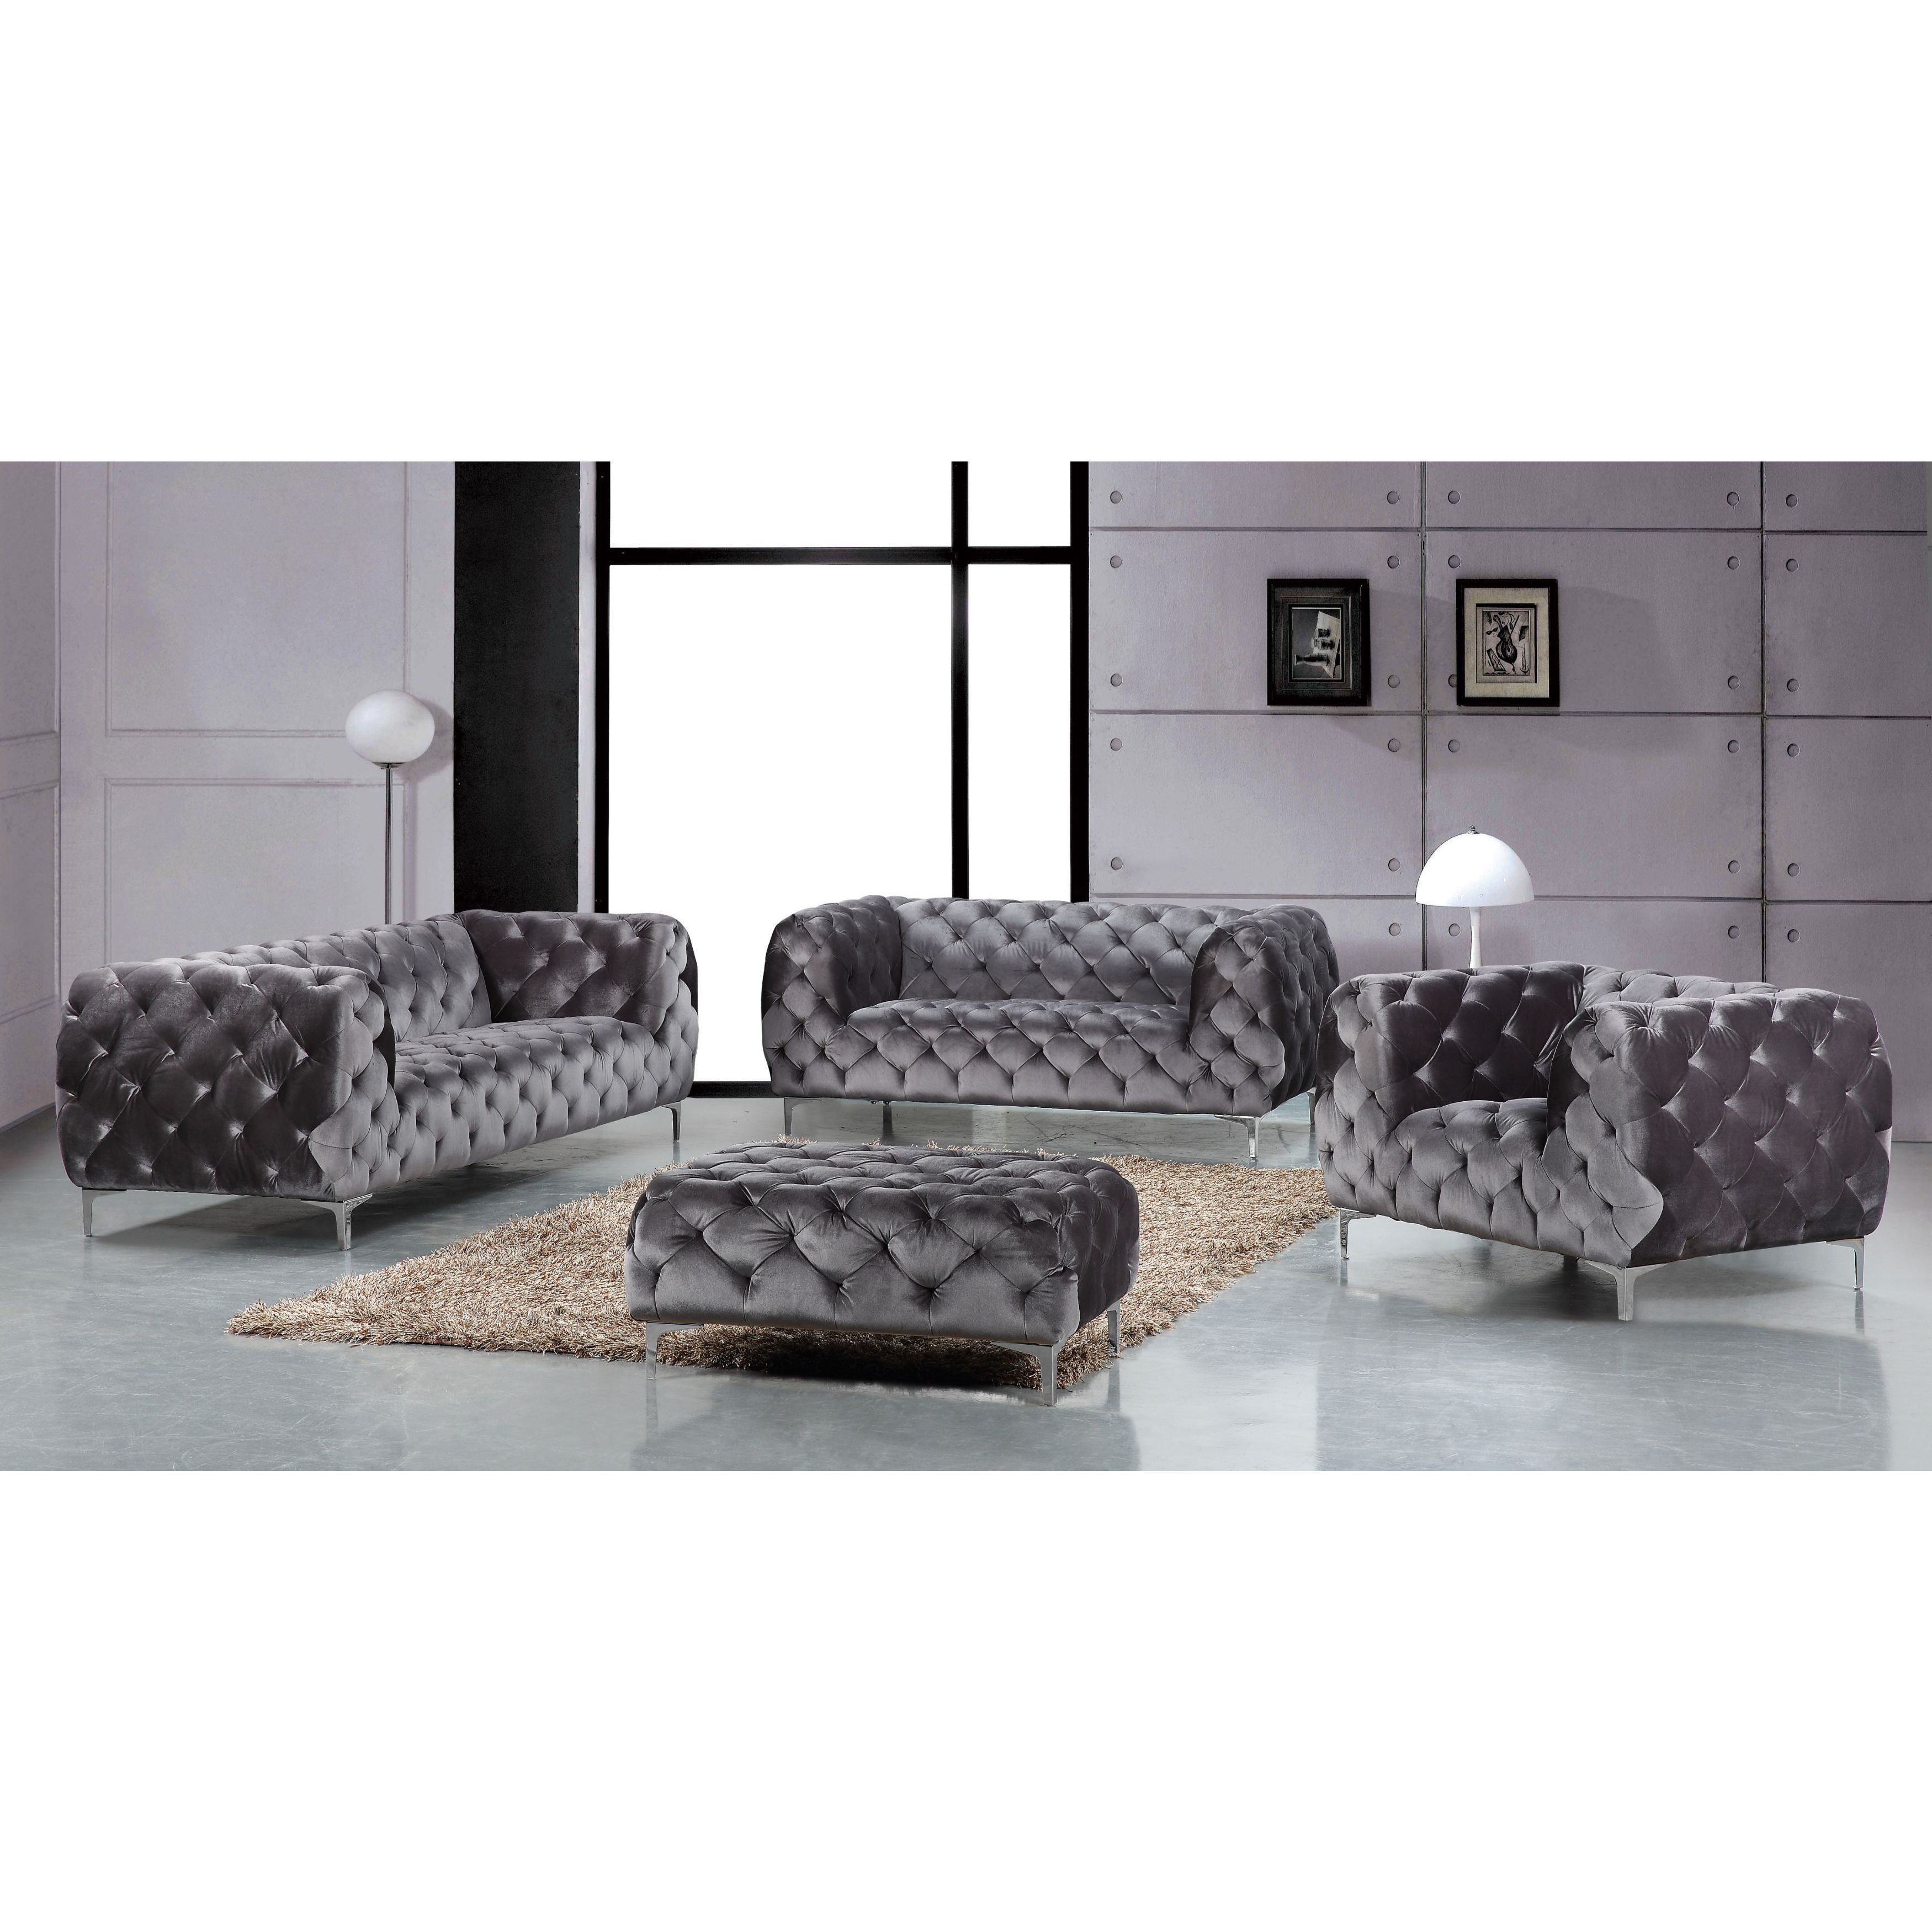 Shop Meridian Mercer Grey Velvet 4 Piece Furniture Set – Free With Regard To Mercer Foam Oversized Sofa Chairs (View 14 of 25)